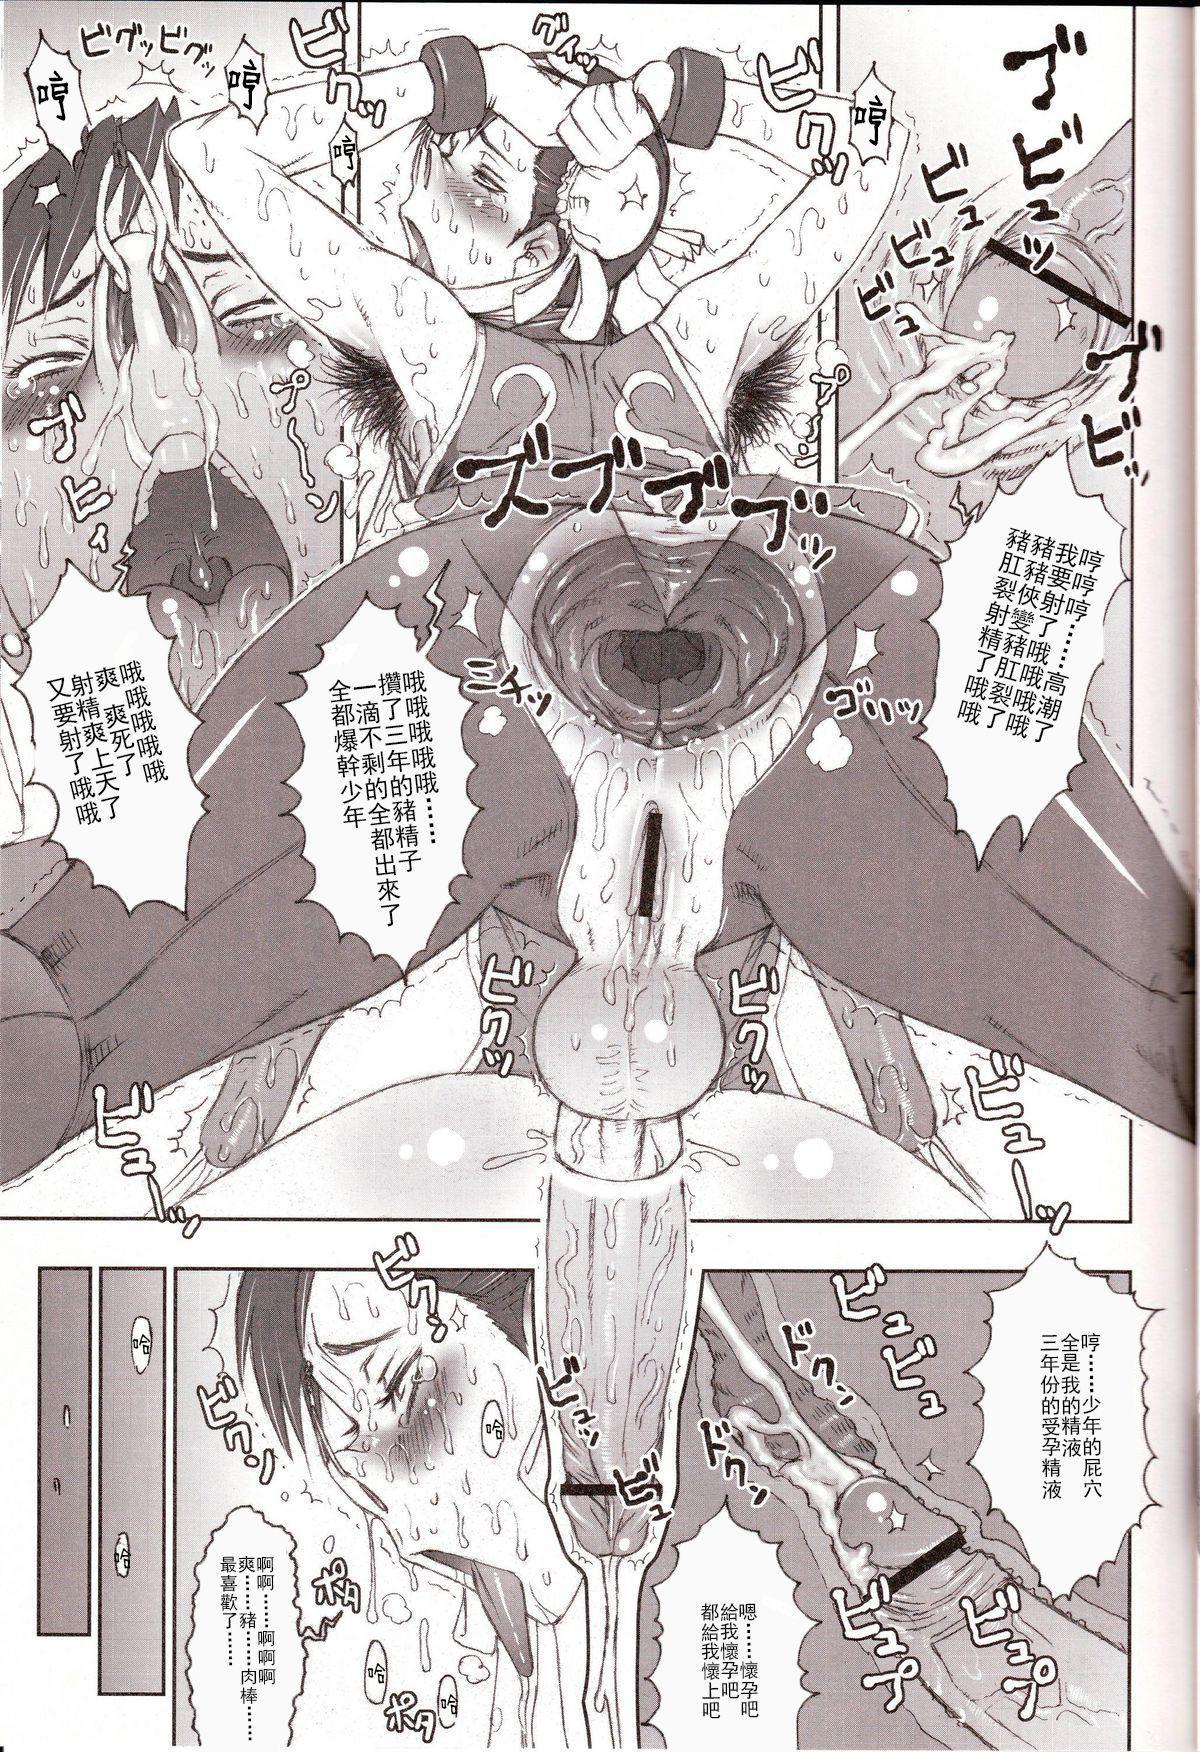 (C70) [Niku Ringo (Kakugari Kyoudai)] NIPPON Onna HEROINE 2 (Darkstalkers, Street Fighter II)[Chinese]【不可视汉化】 27